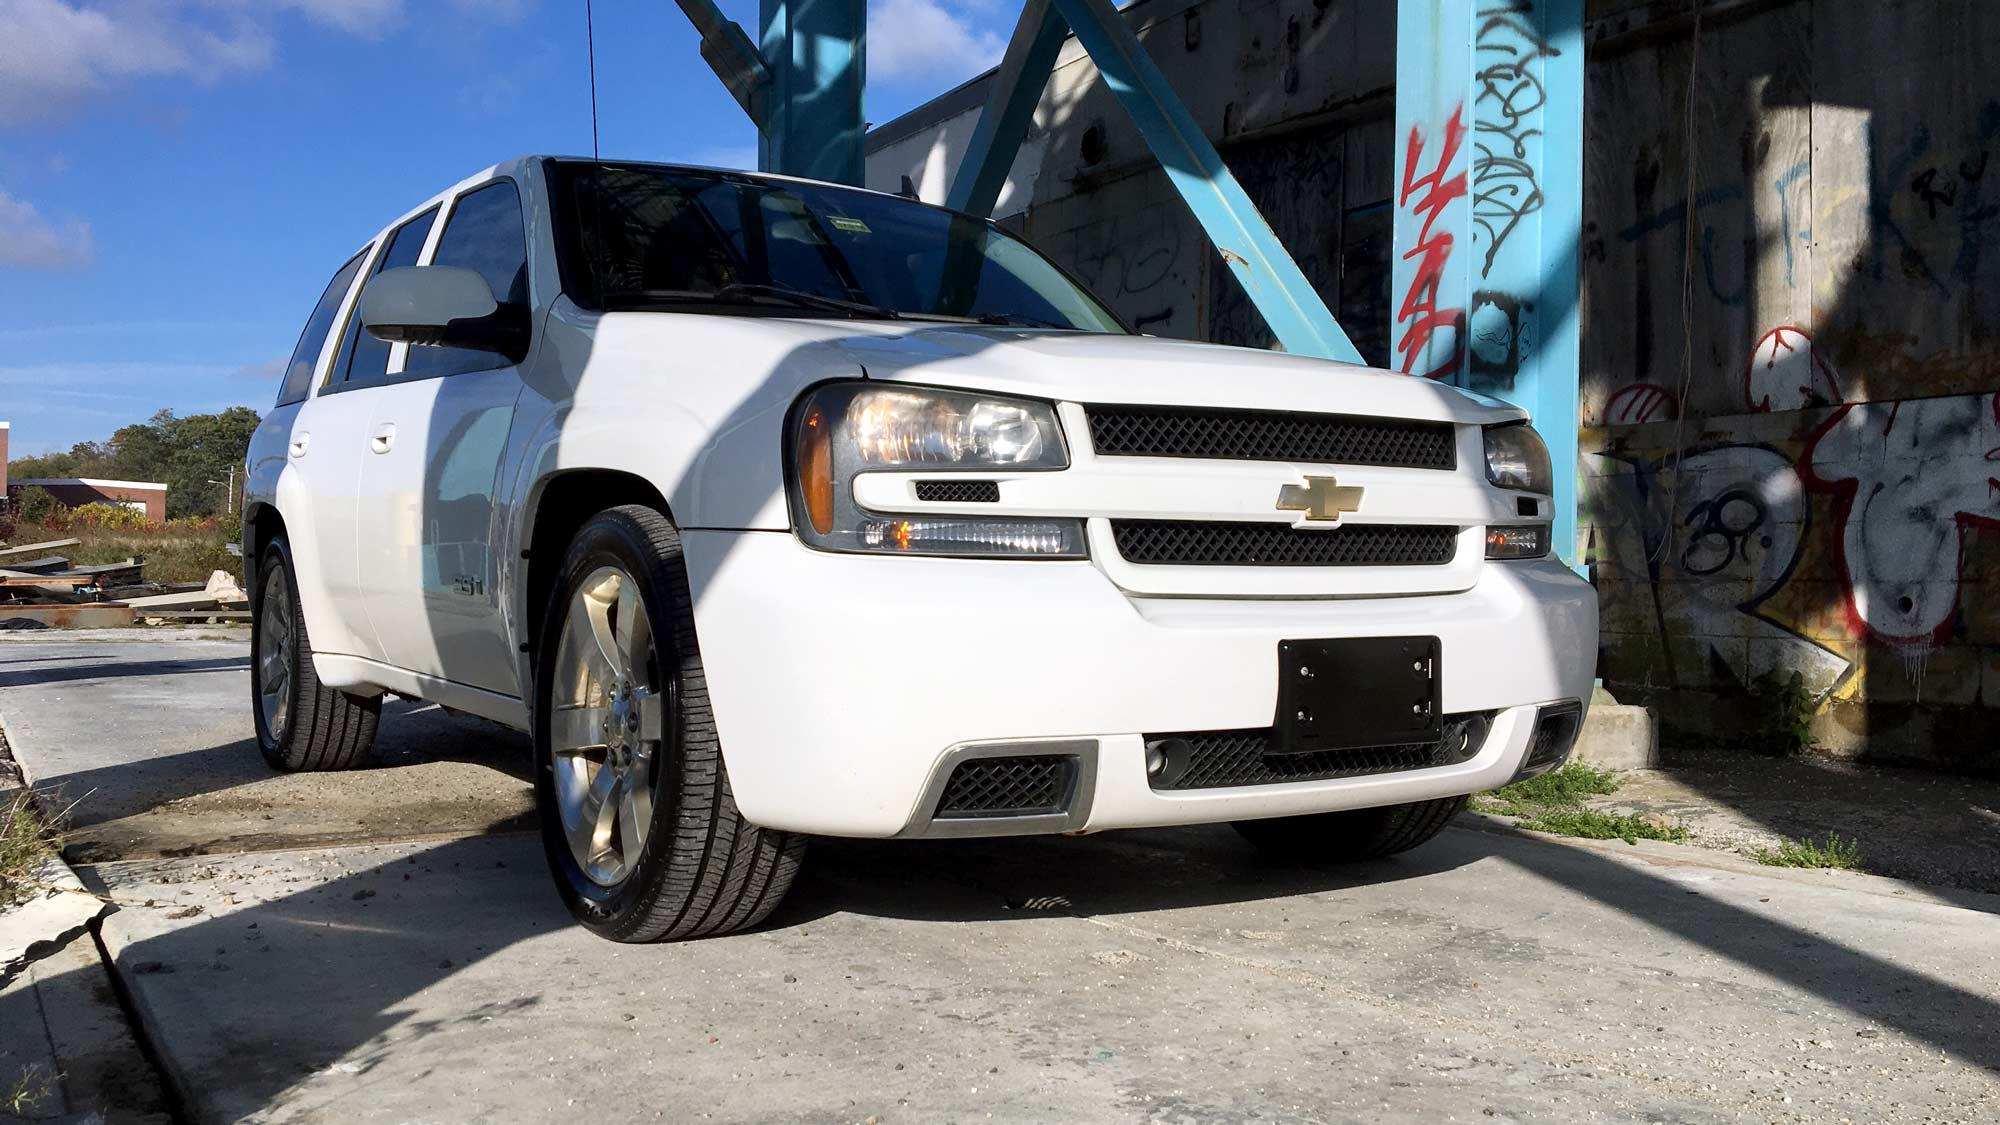 Now Live: 2008 Chevrolet Trailblazer SS (3SS) - NICANORTH